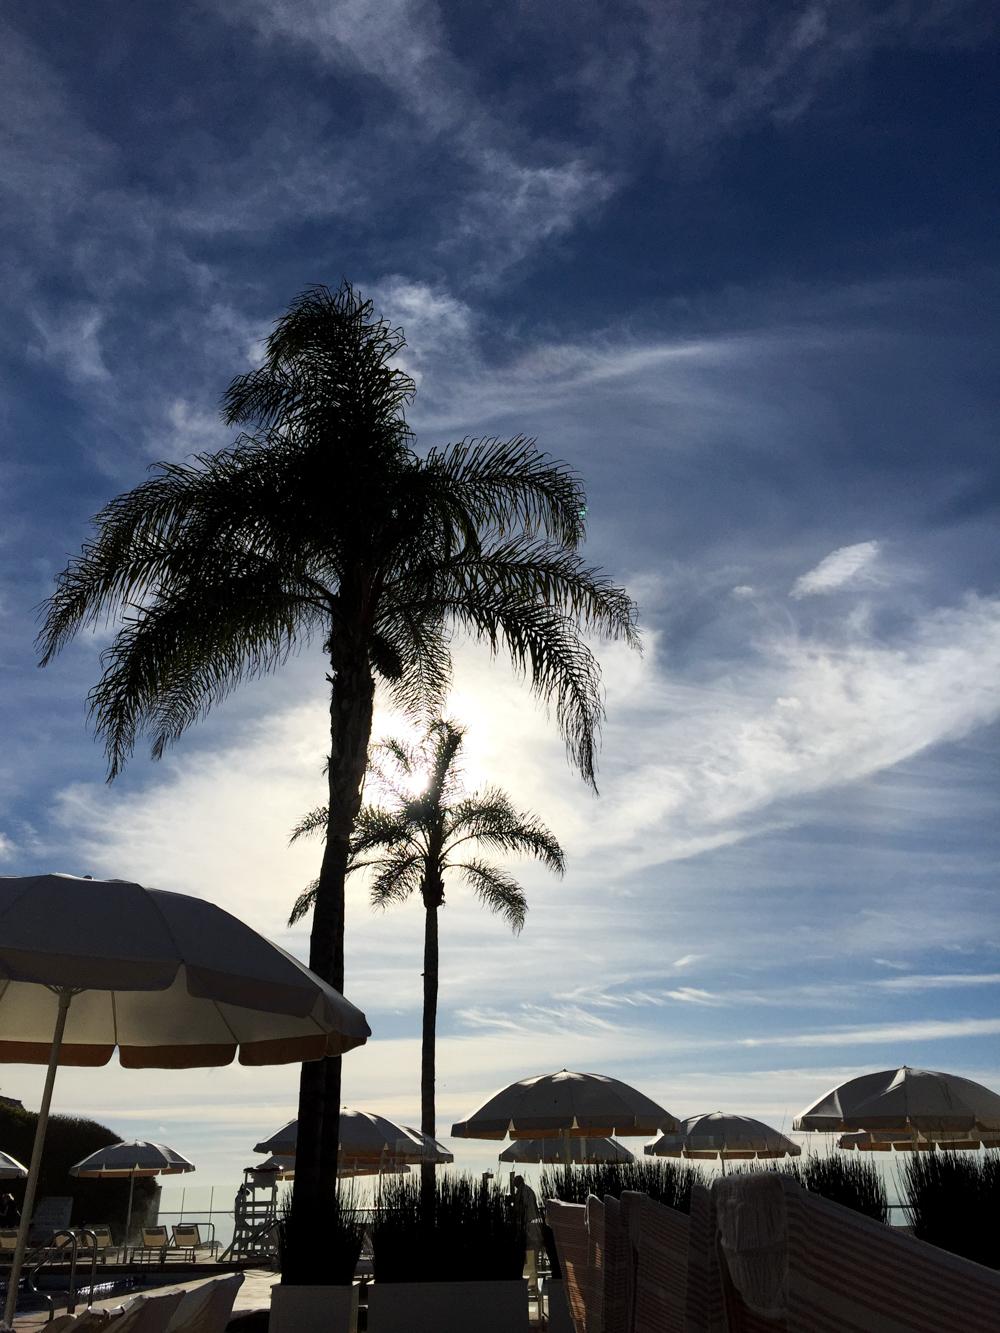 Four Seasons The Biltmore in Santa Barbara and the Coral Casino Beach and Cabana Club Pool